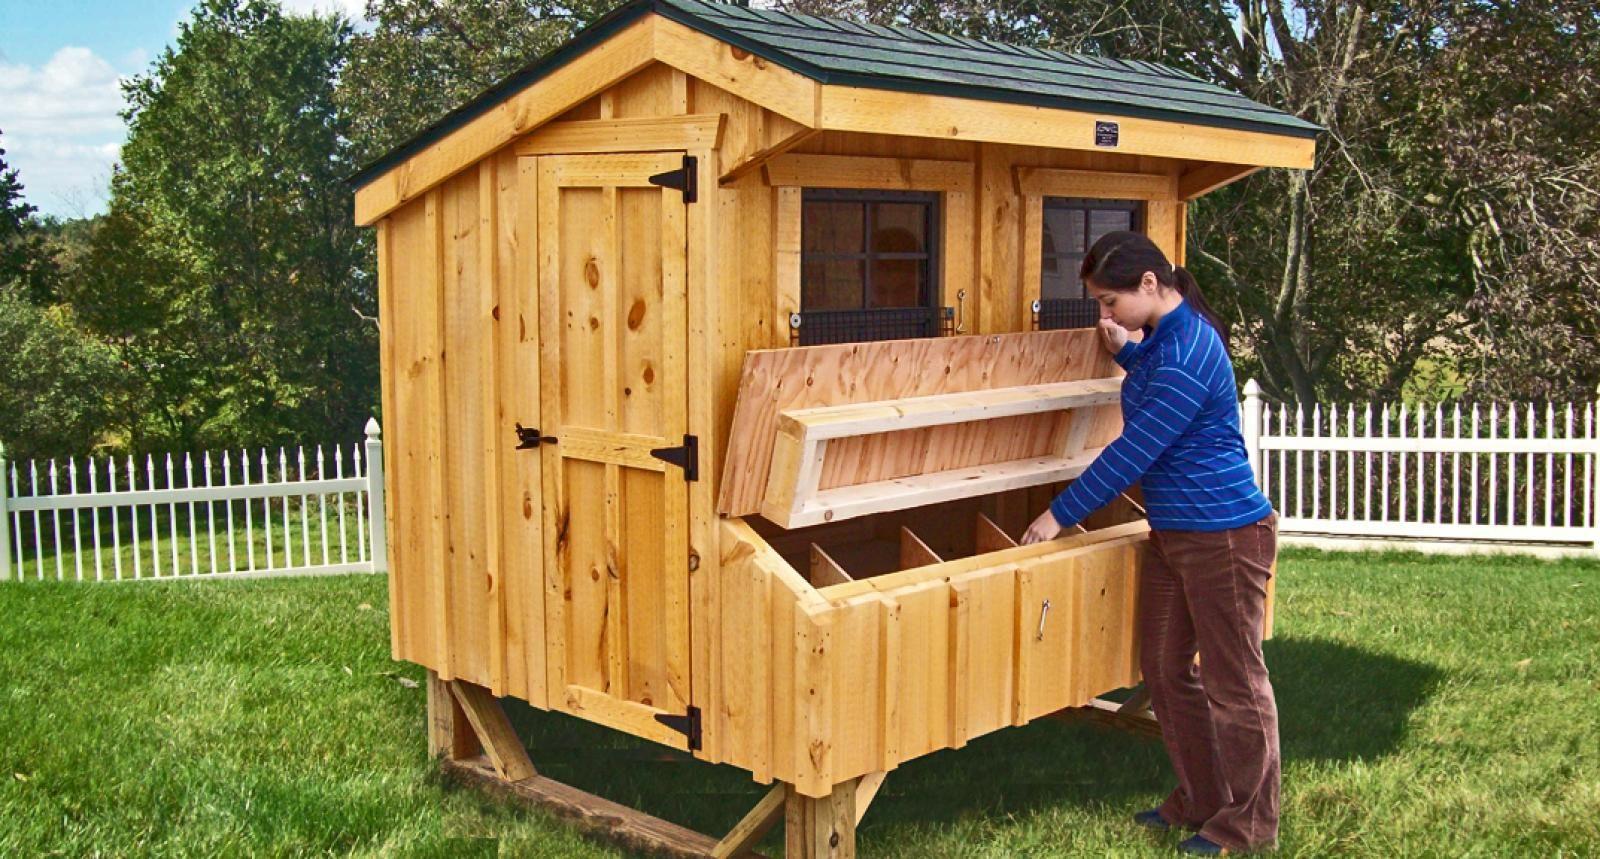 Quaker Chicken Coop Chicken Houses For Sale Horizon Structures Chicken Coop Chickens Backyard Chicken Coop Plans